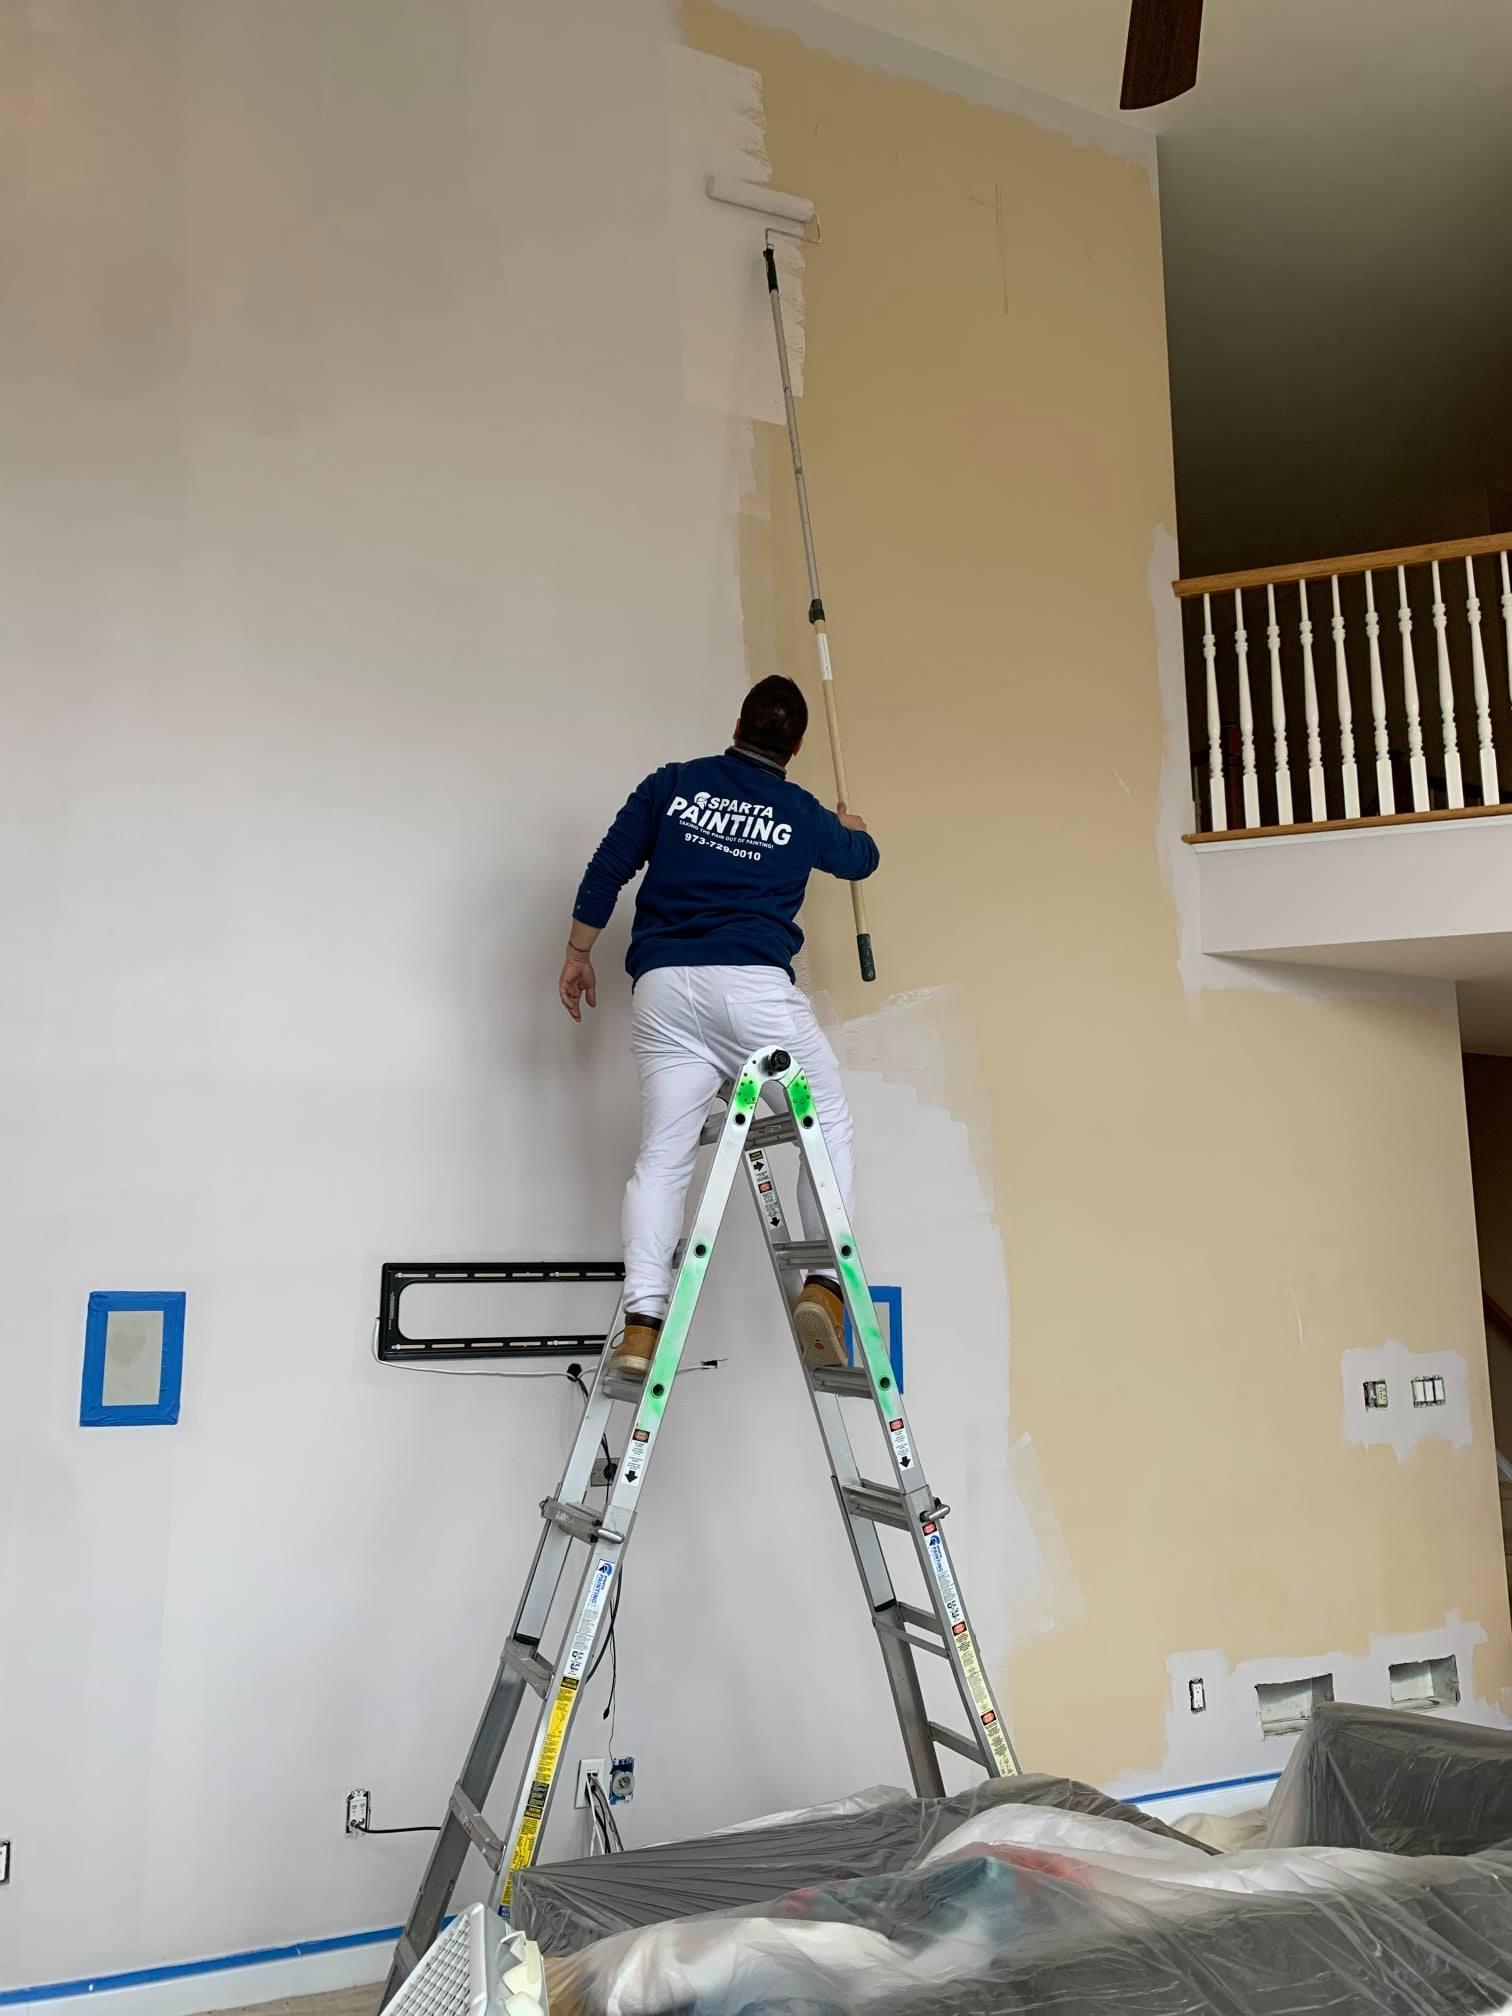 man painting on ladder